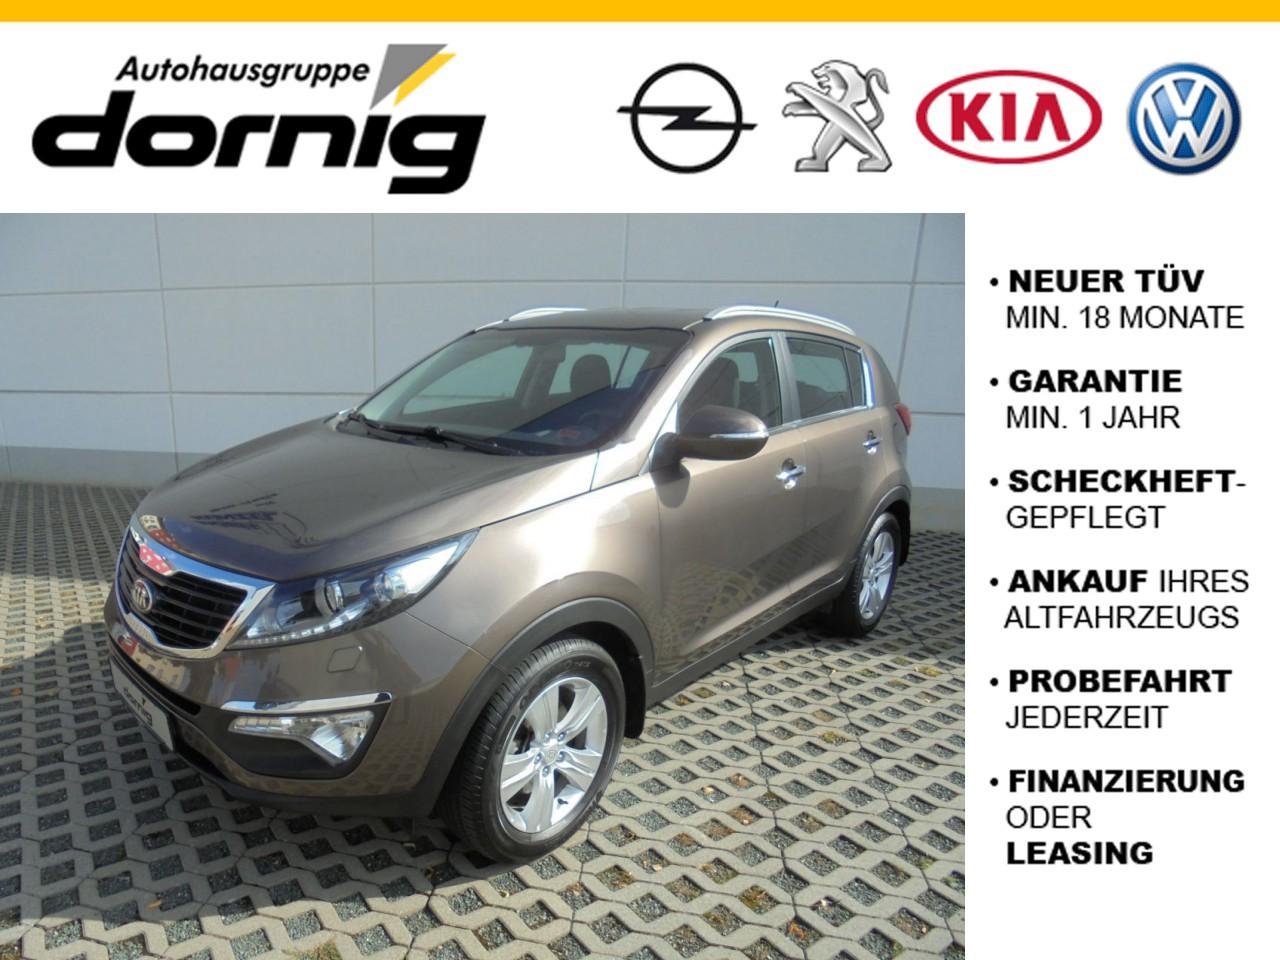 Kia Sportage 1.6 GDI Vision, Sitzh.,Xenon, Jahr 2013, Benzin